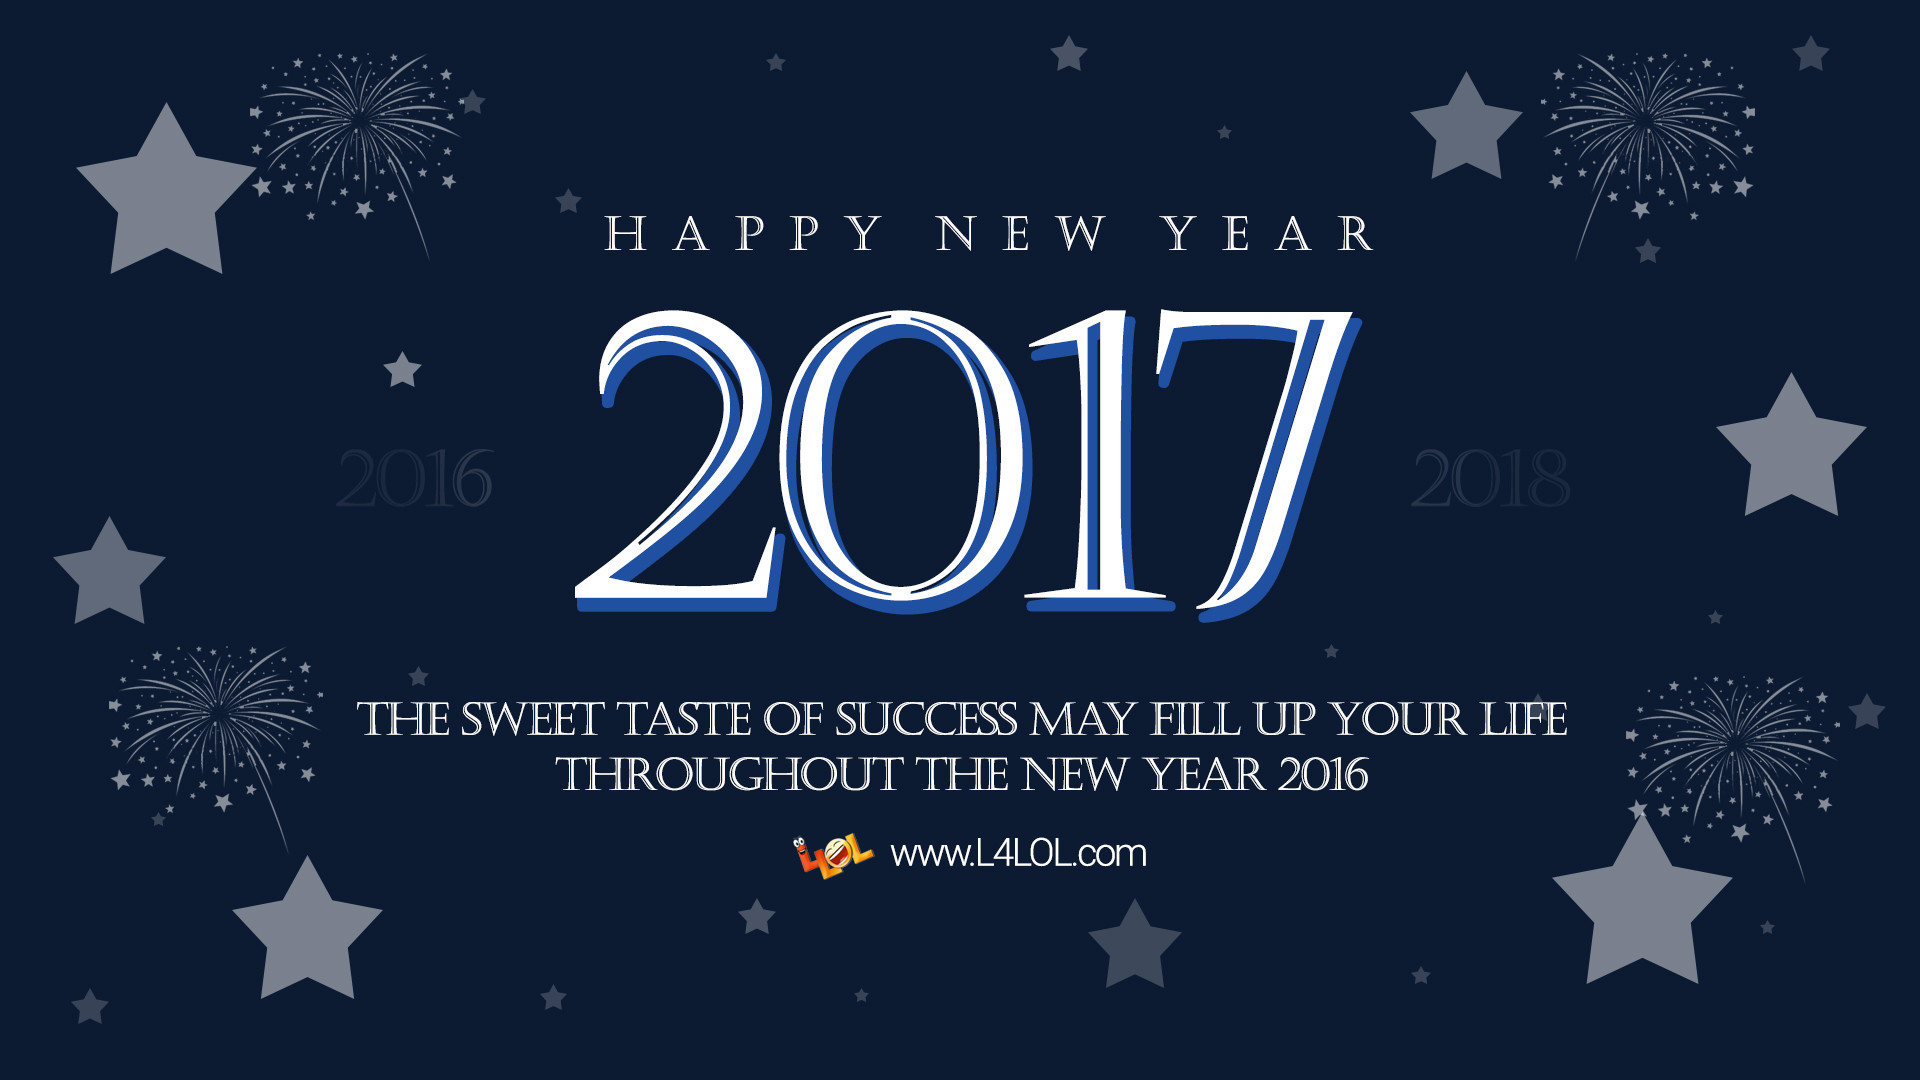 Happy New Year 2017 Wallpapers – https://www.welcomehappynewyear2016.com/